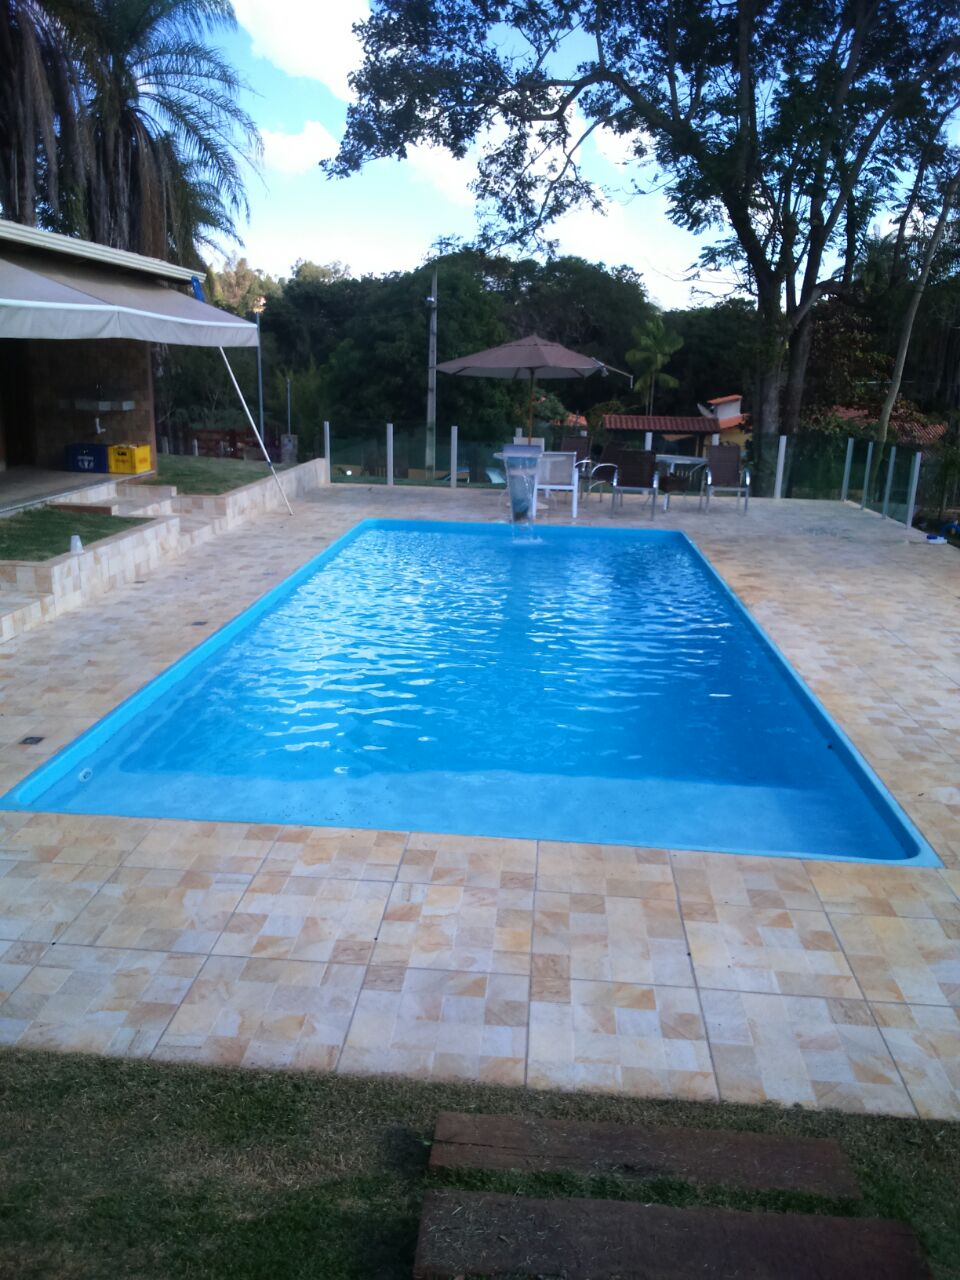 Piscina de fibra bh mg piscina grande mar azul loja bh for Piscinas modelos